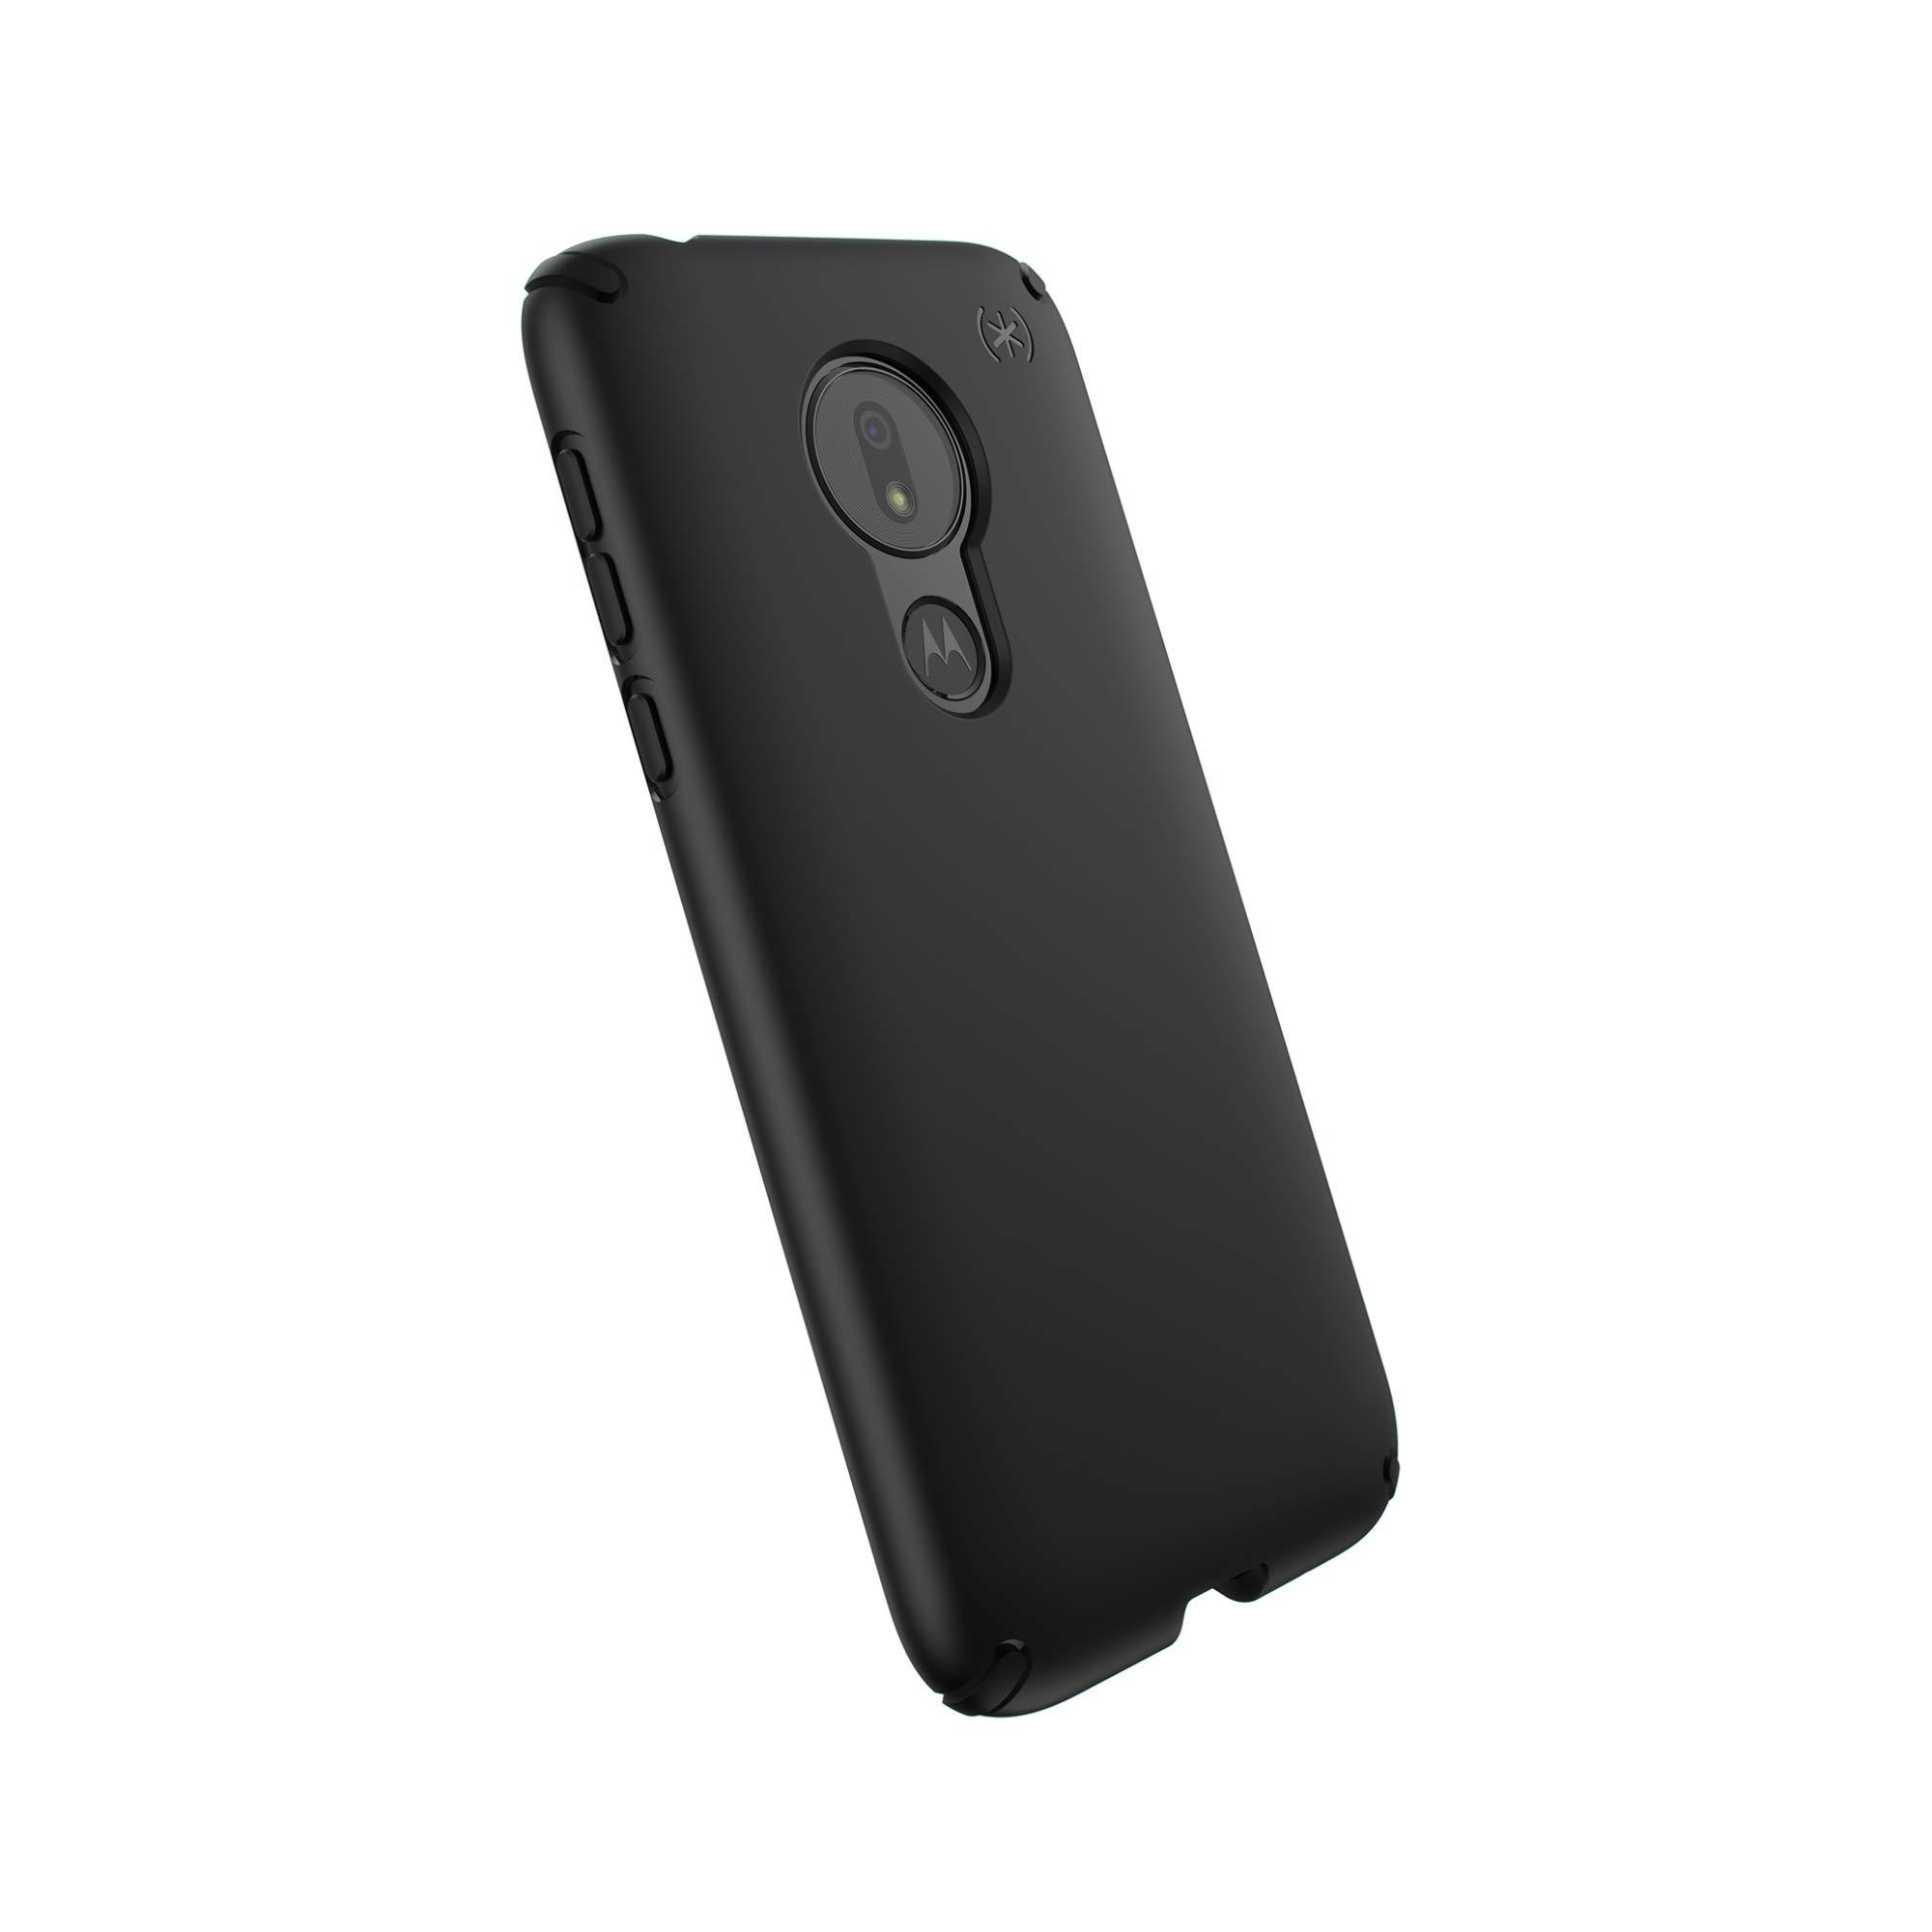 Speck Products Presidio Lite Moto G7 Power Case, Black by Speck